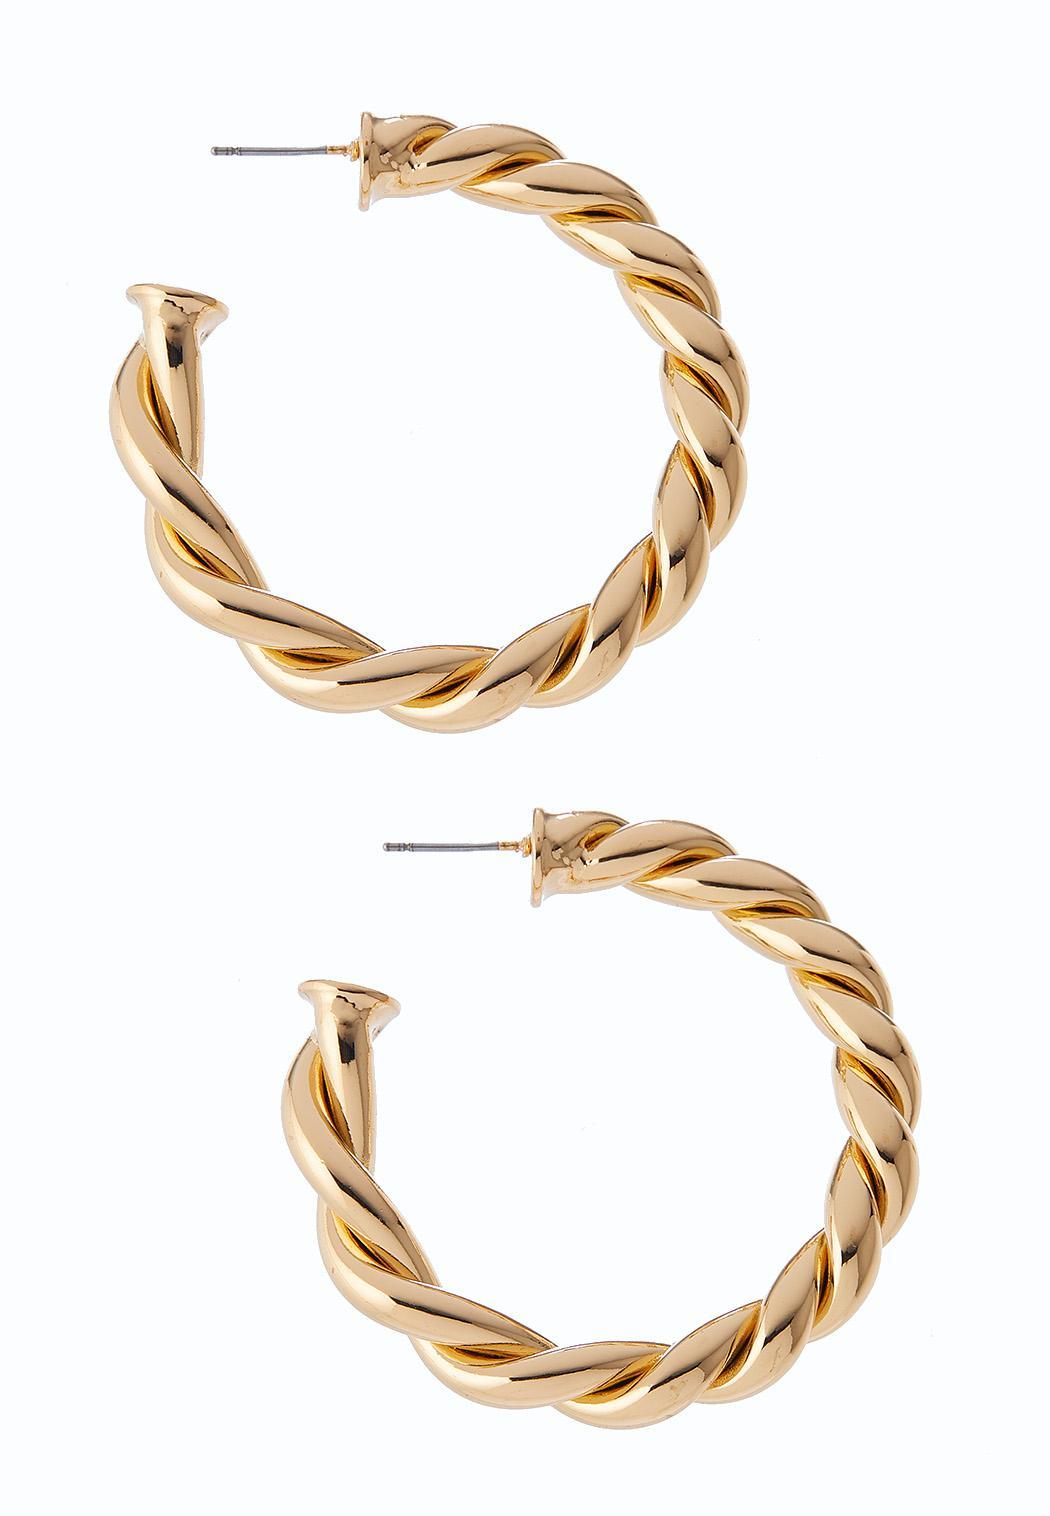 Chunky Twisted Gold Hoop Earrings